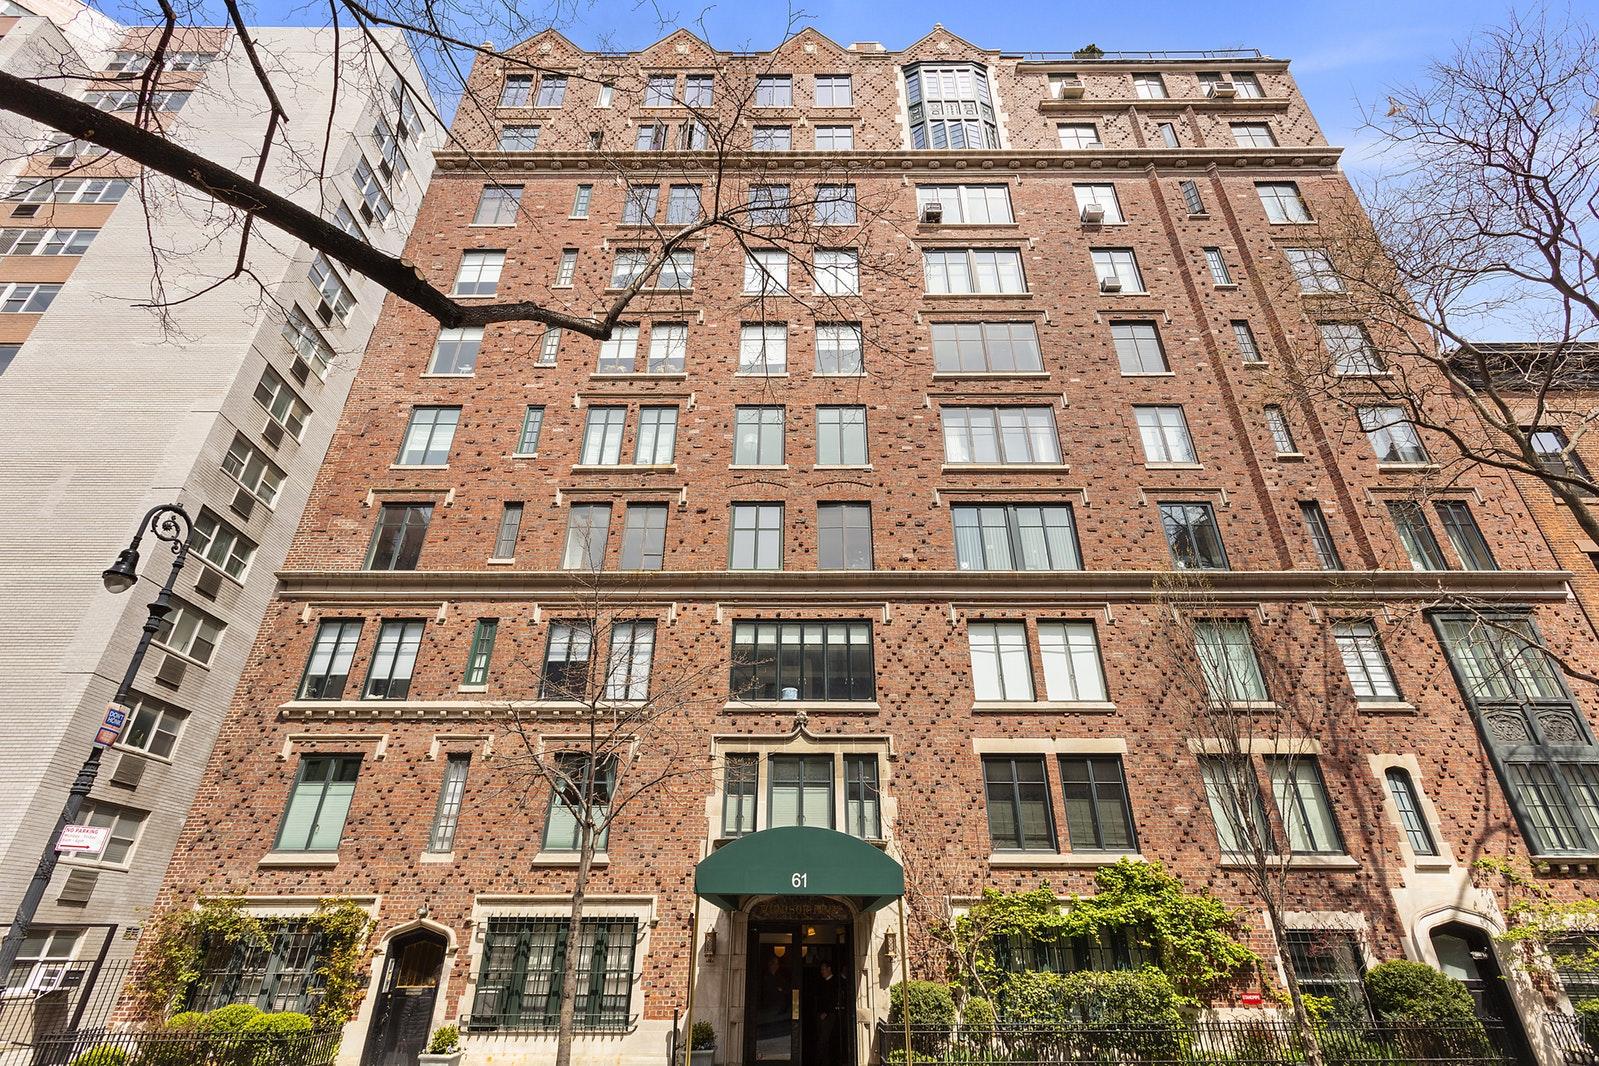 61 WEST 9TH STREET 4A, West Village, $2,200,000, Web #: 19564540